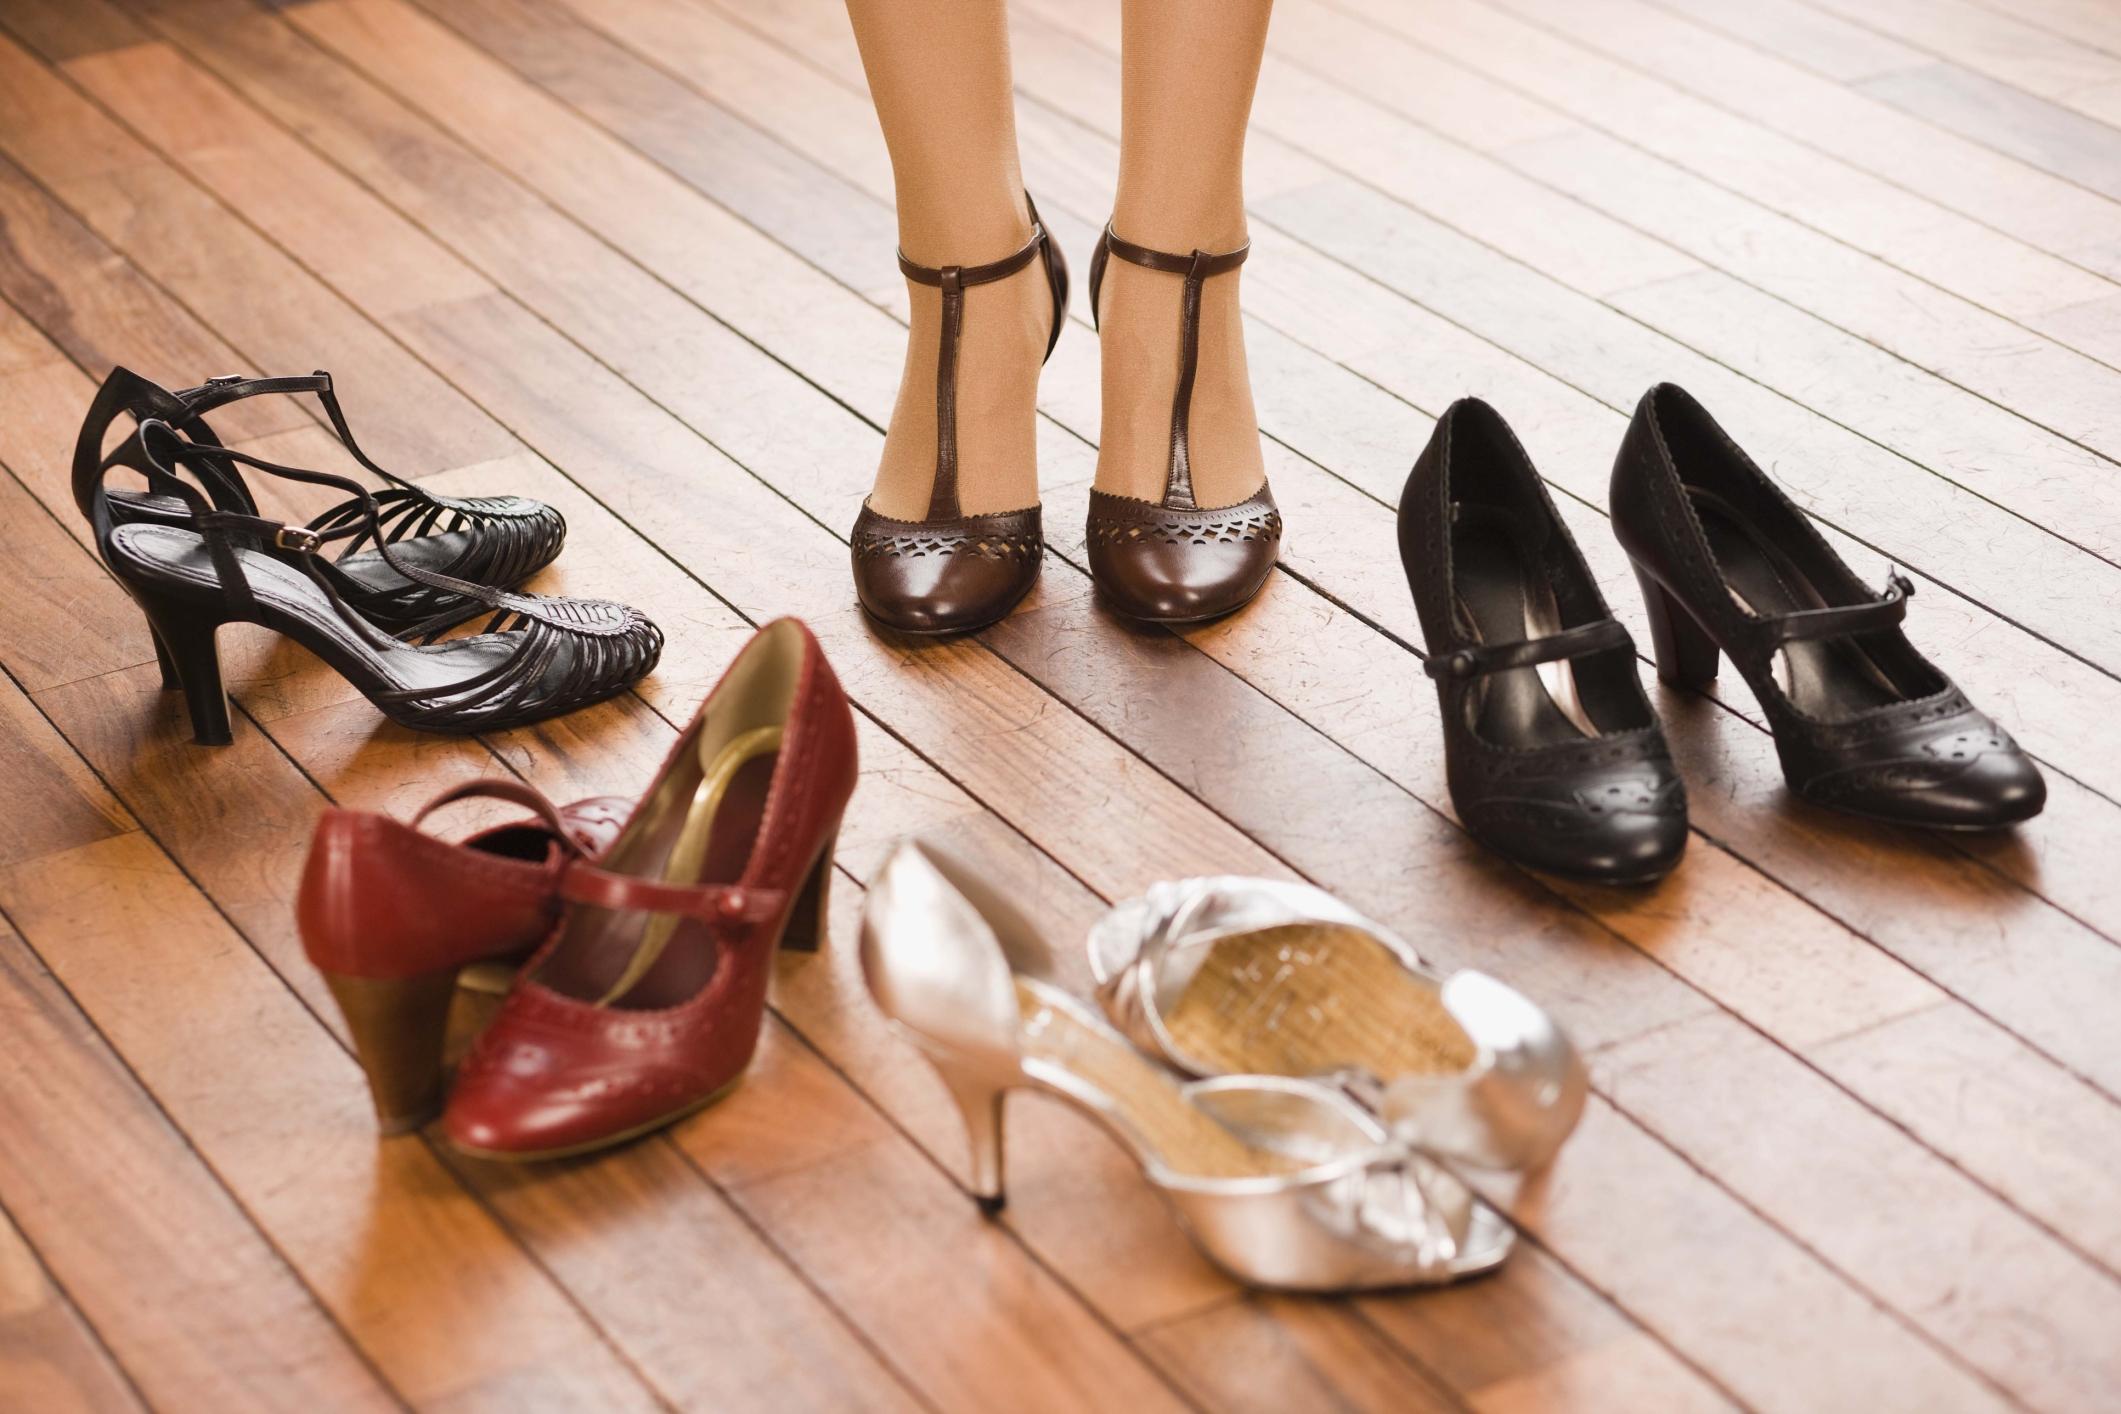 Примерка обуви фото 11 фотография